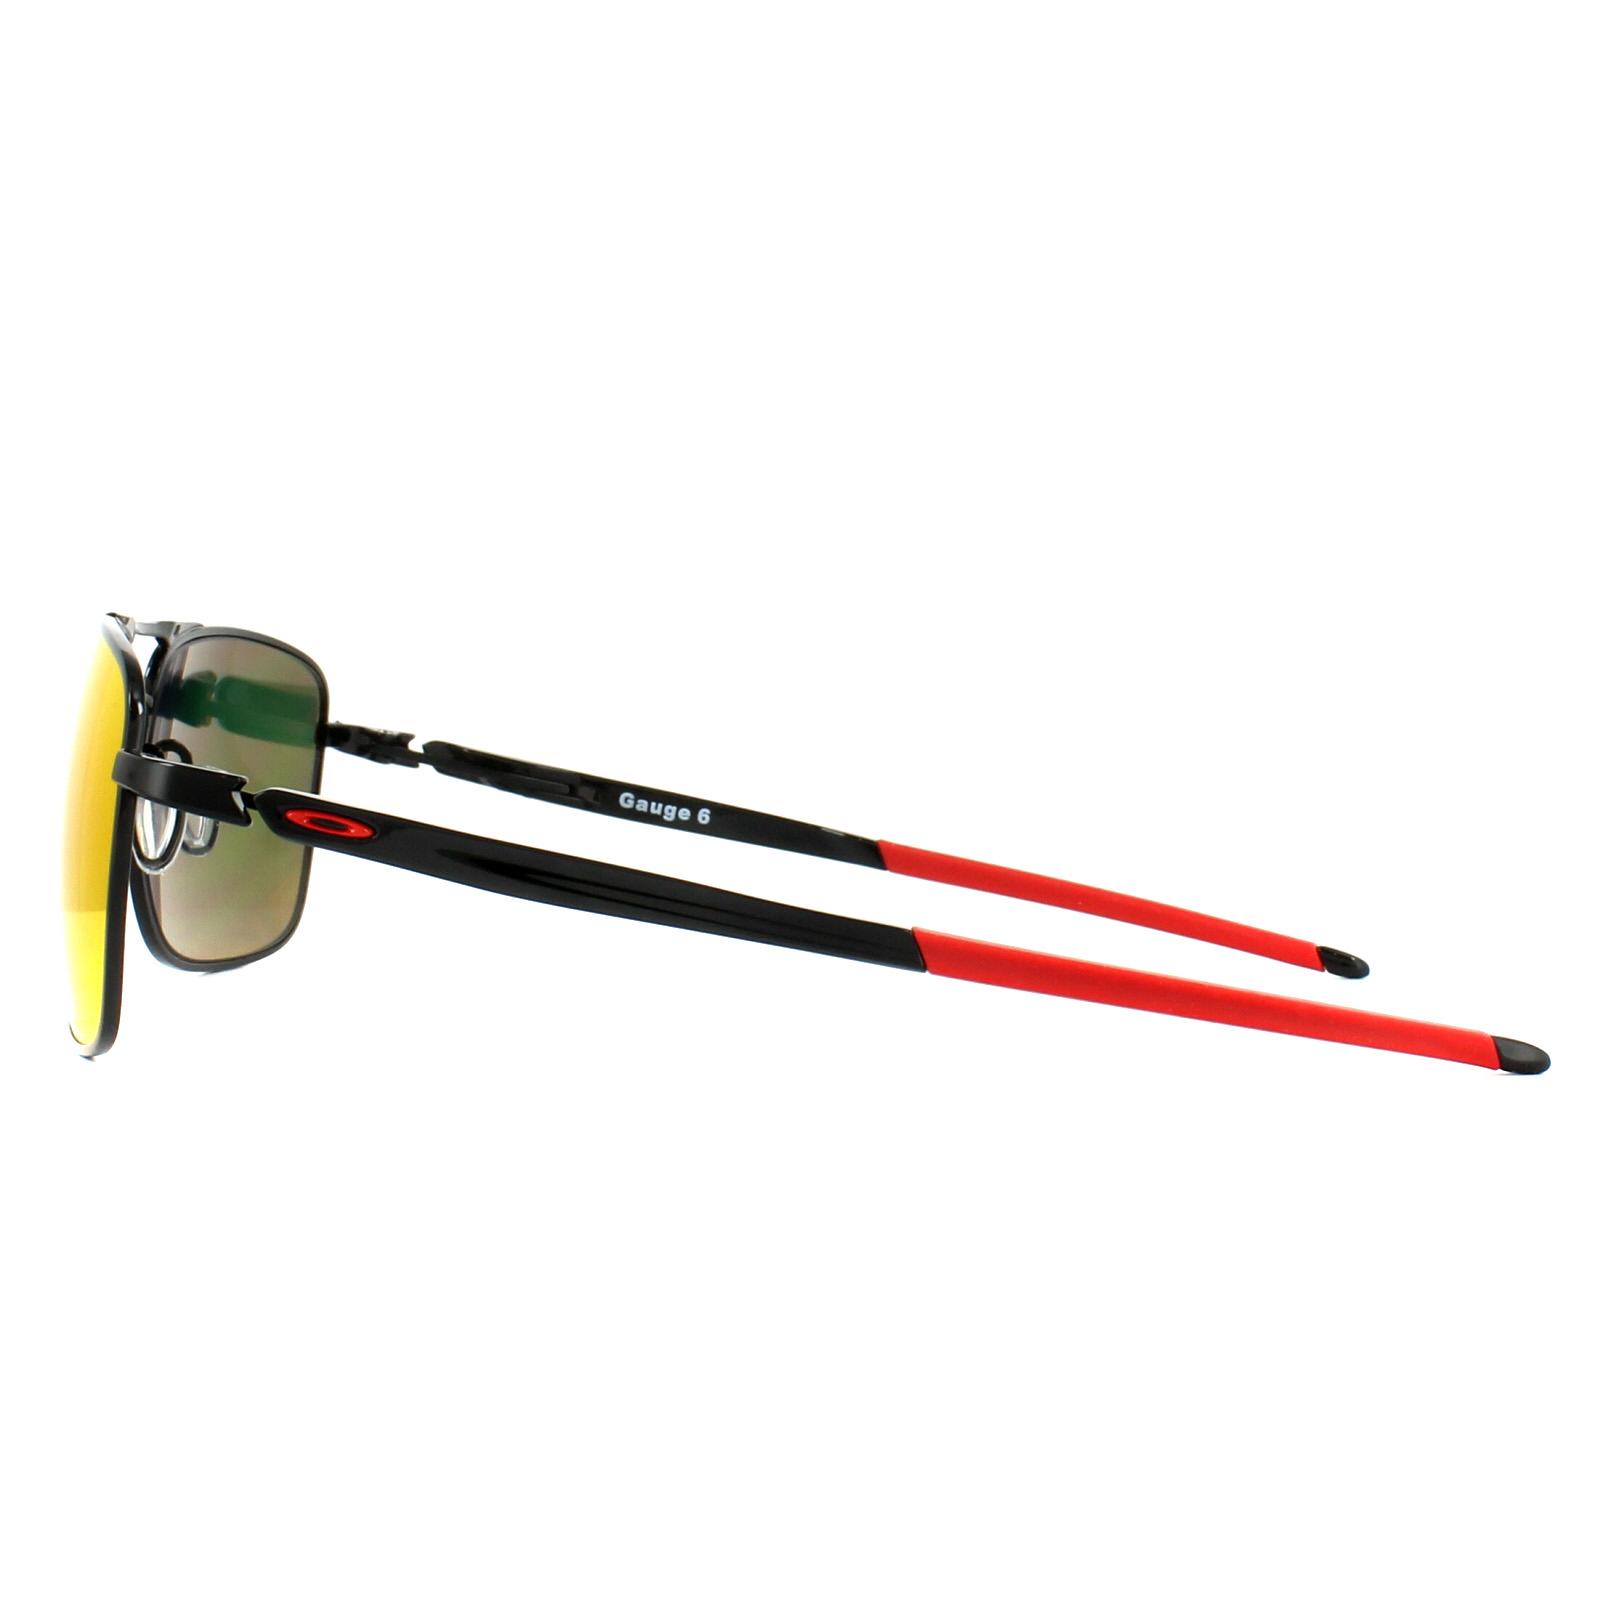 7b61aedb03c Sentinel Oakley Sunglasses Gauge 6 OO6038-04 Polished Black Prizm Ruby  Polarized